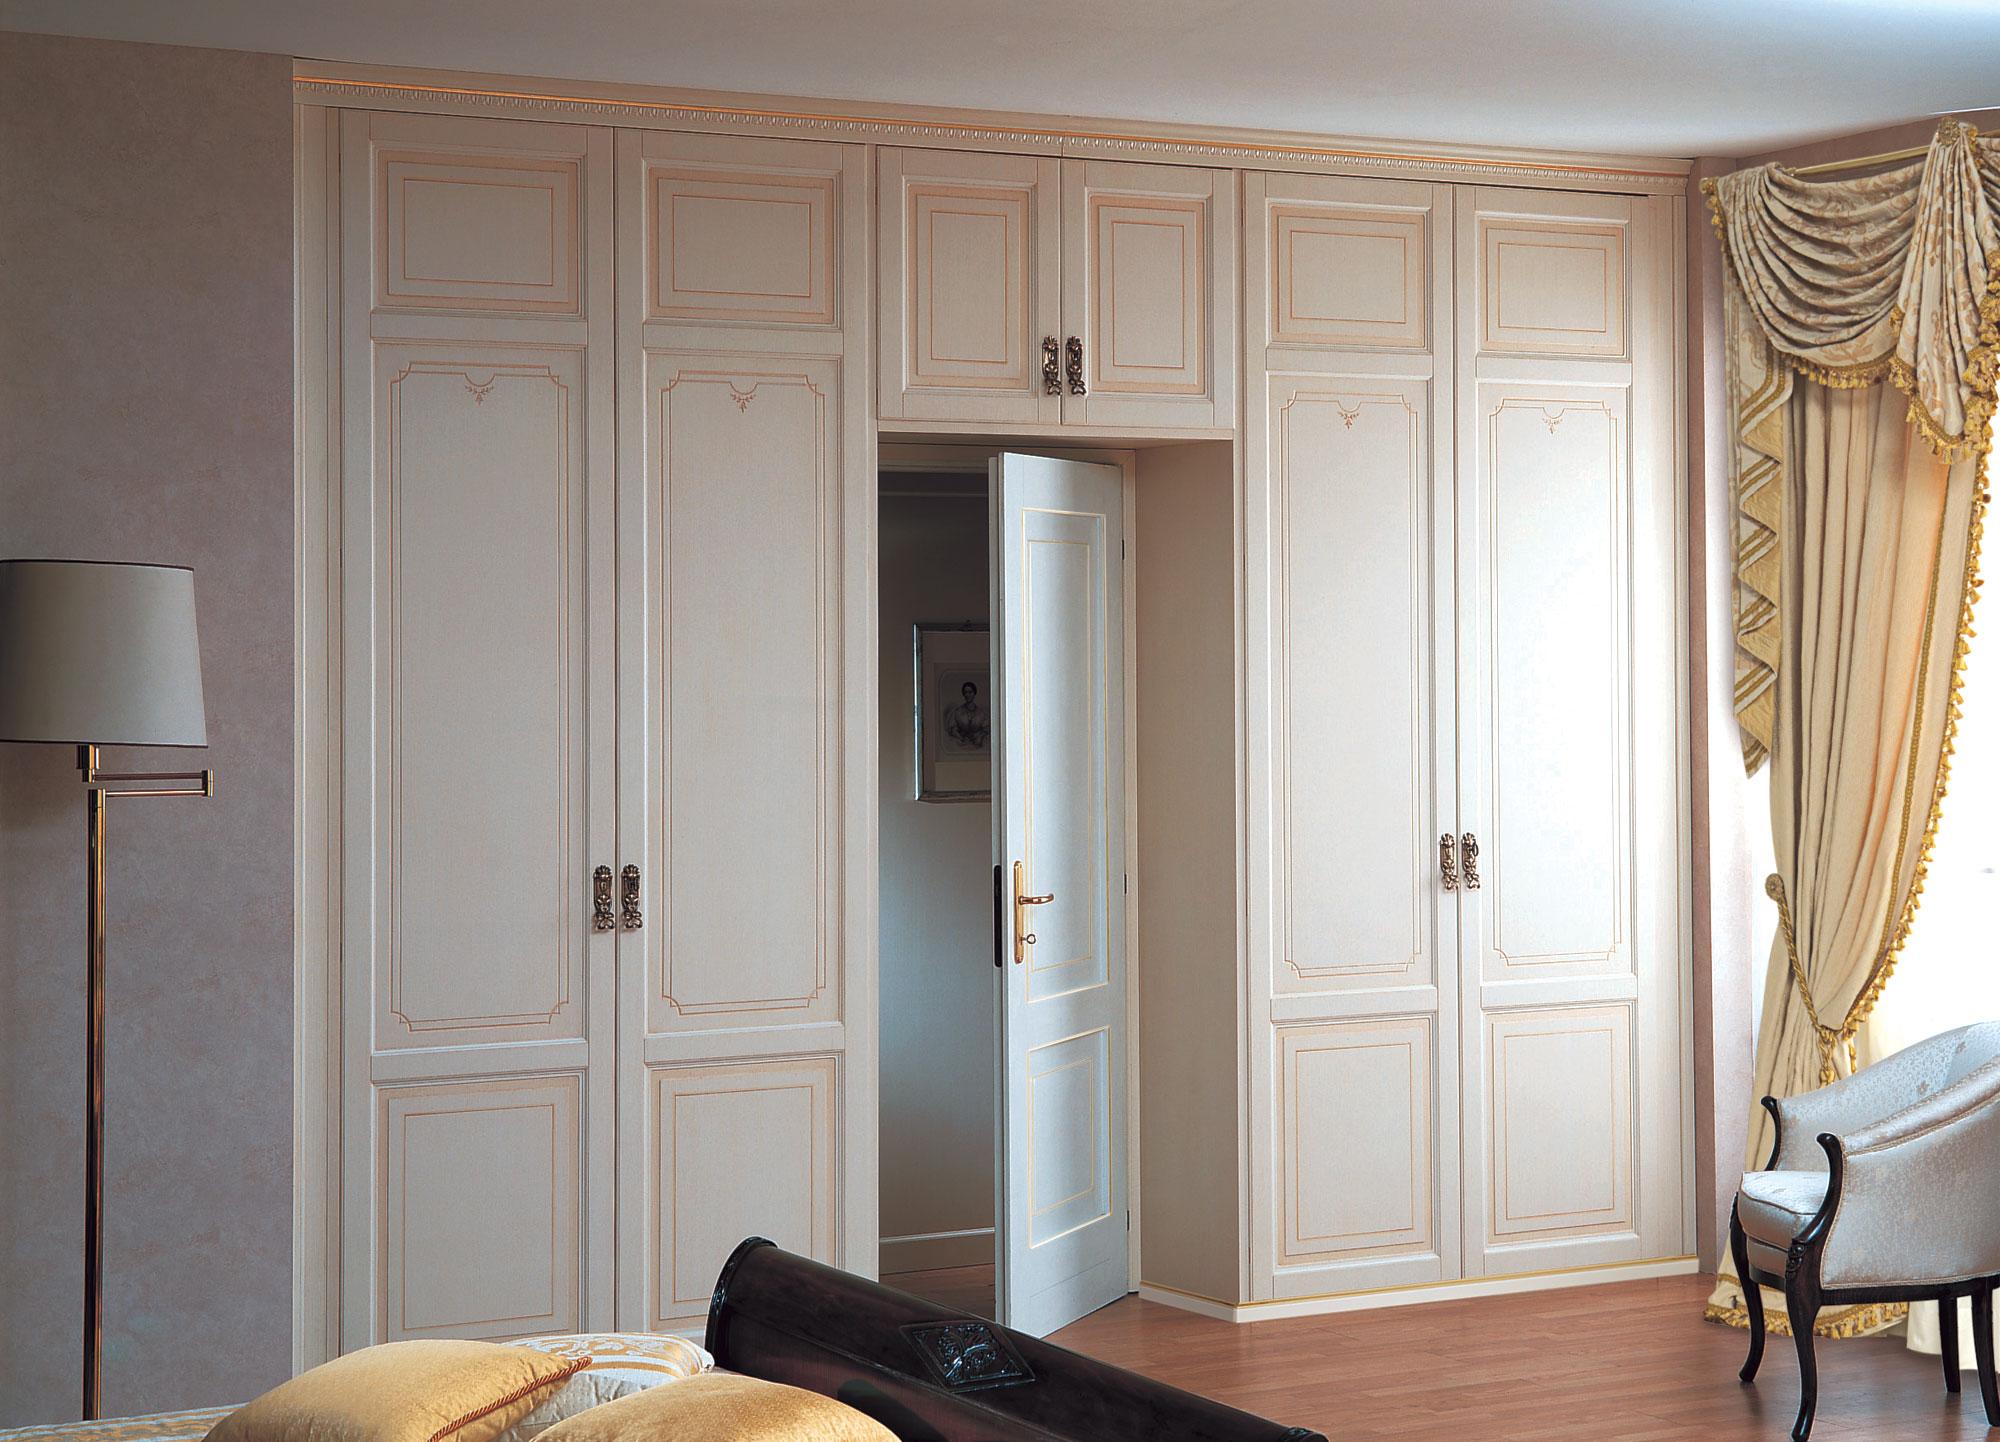 Шкафы купе в классическом стиле. балтийский шкаф: купить шка.